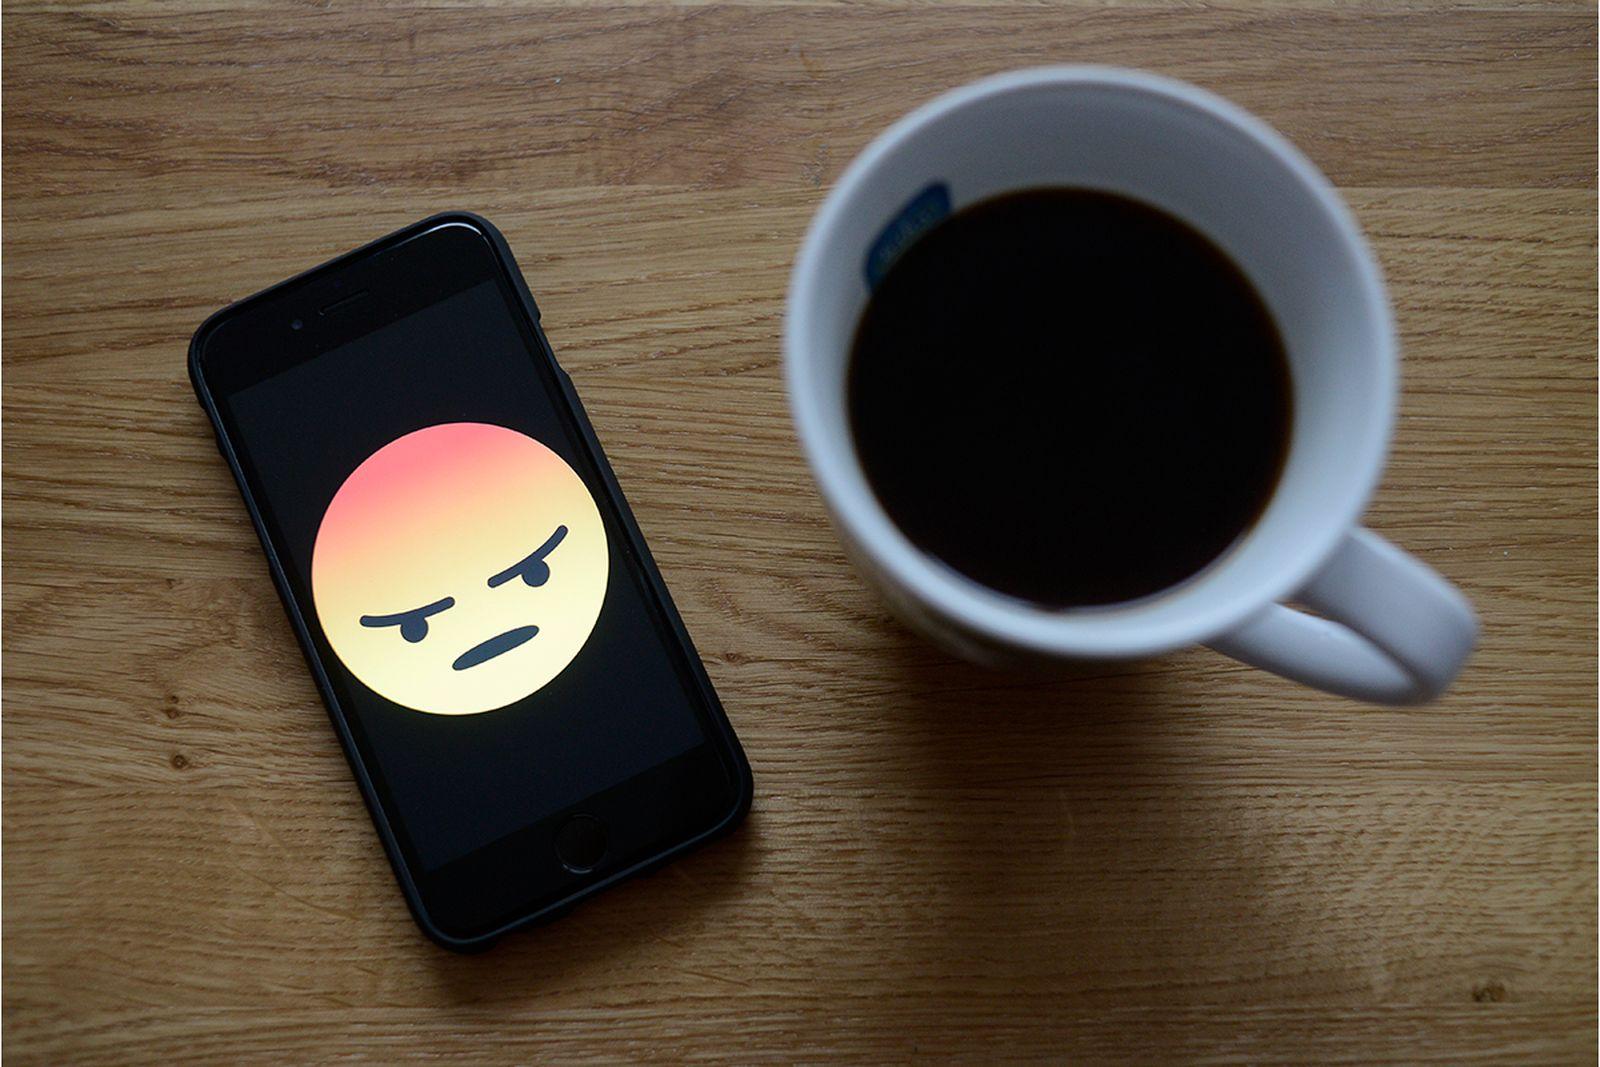 apple gender neutral emojis Gender-Neutral